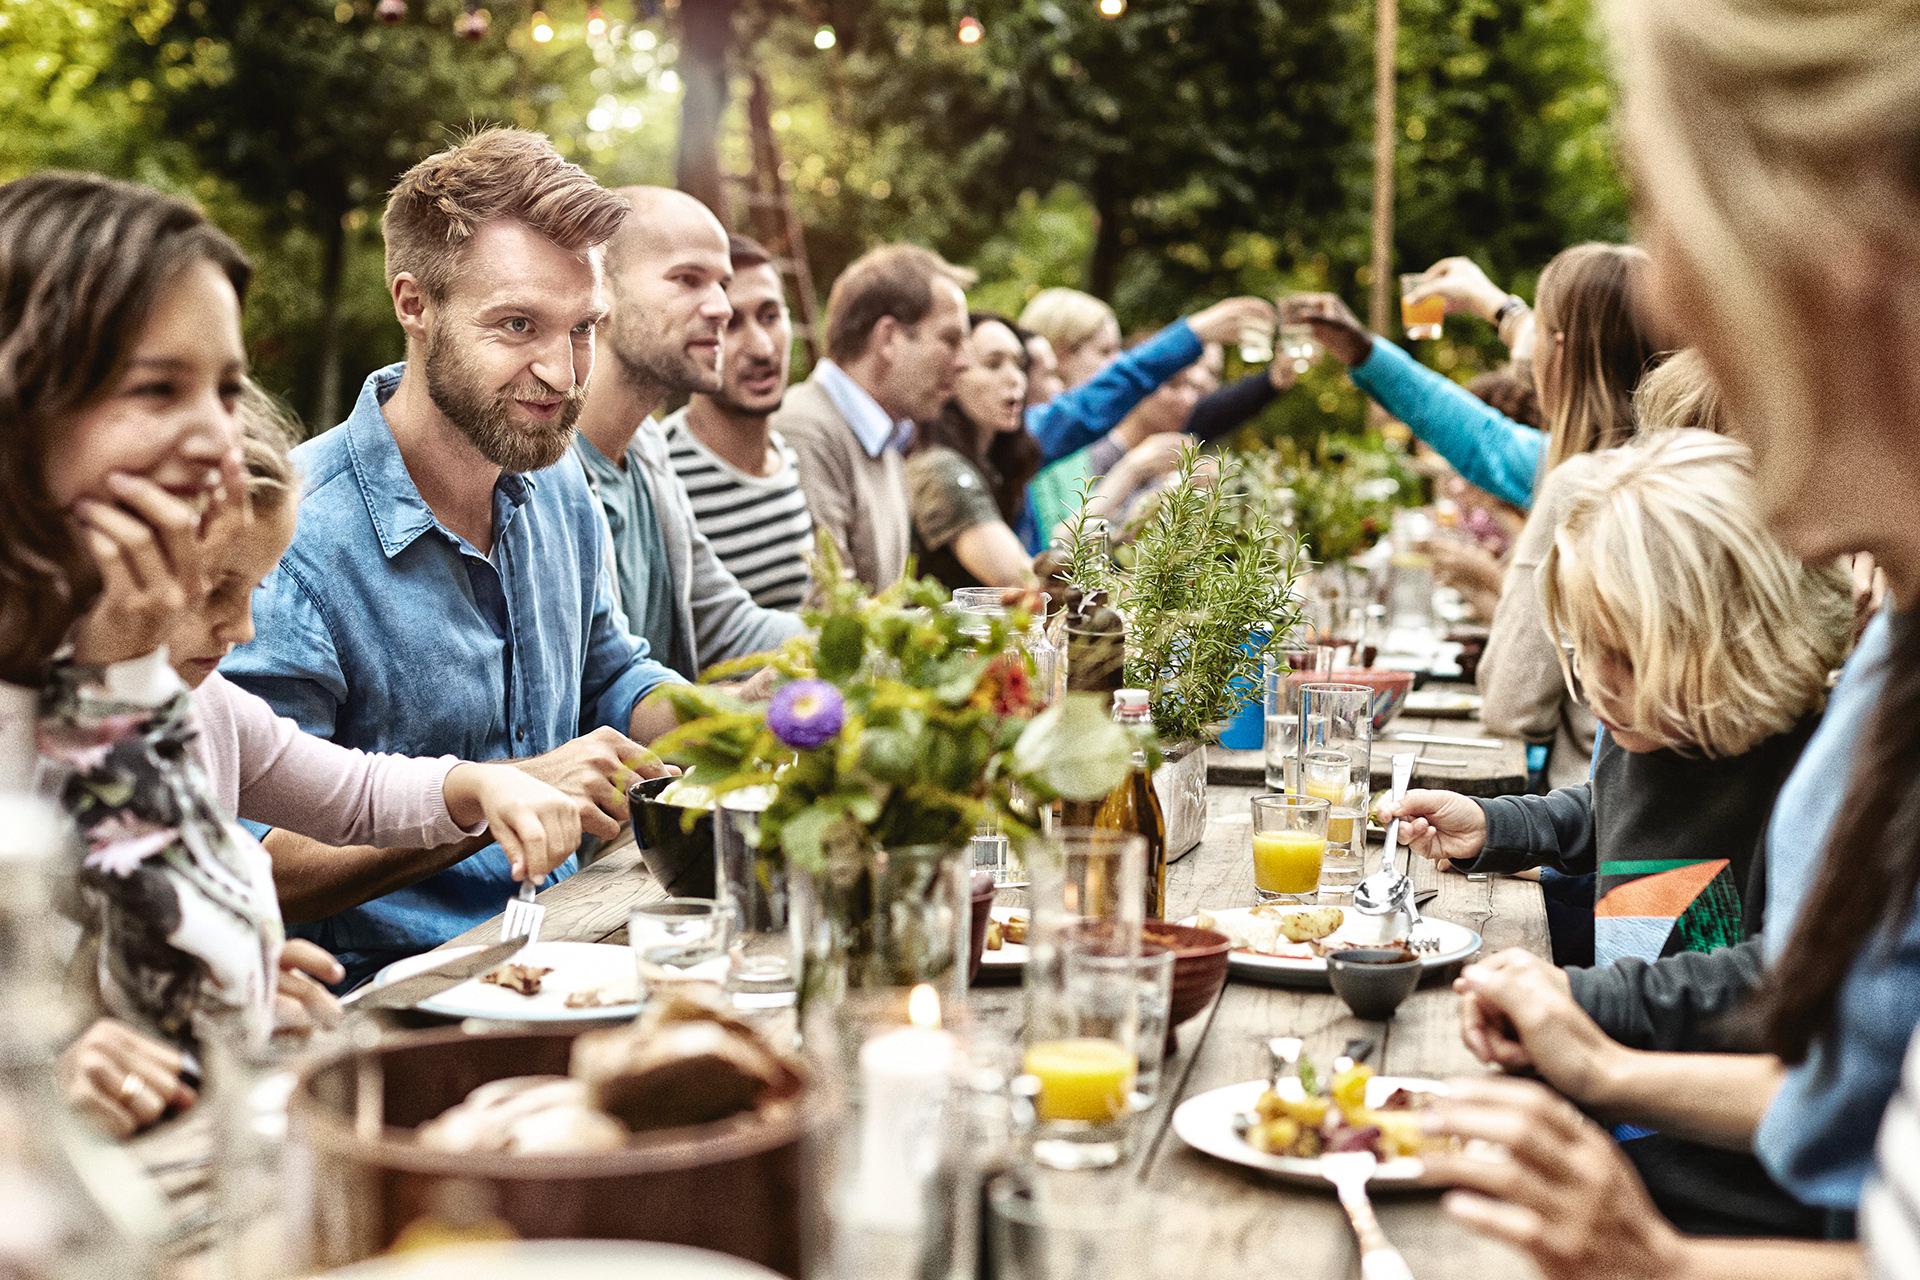 grillszene-tafel-people-weber